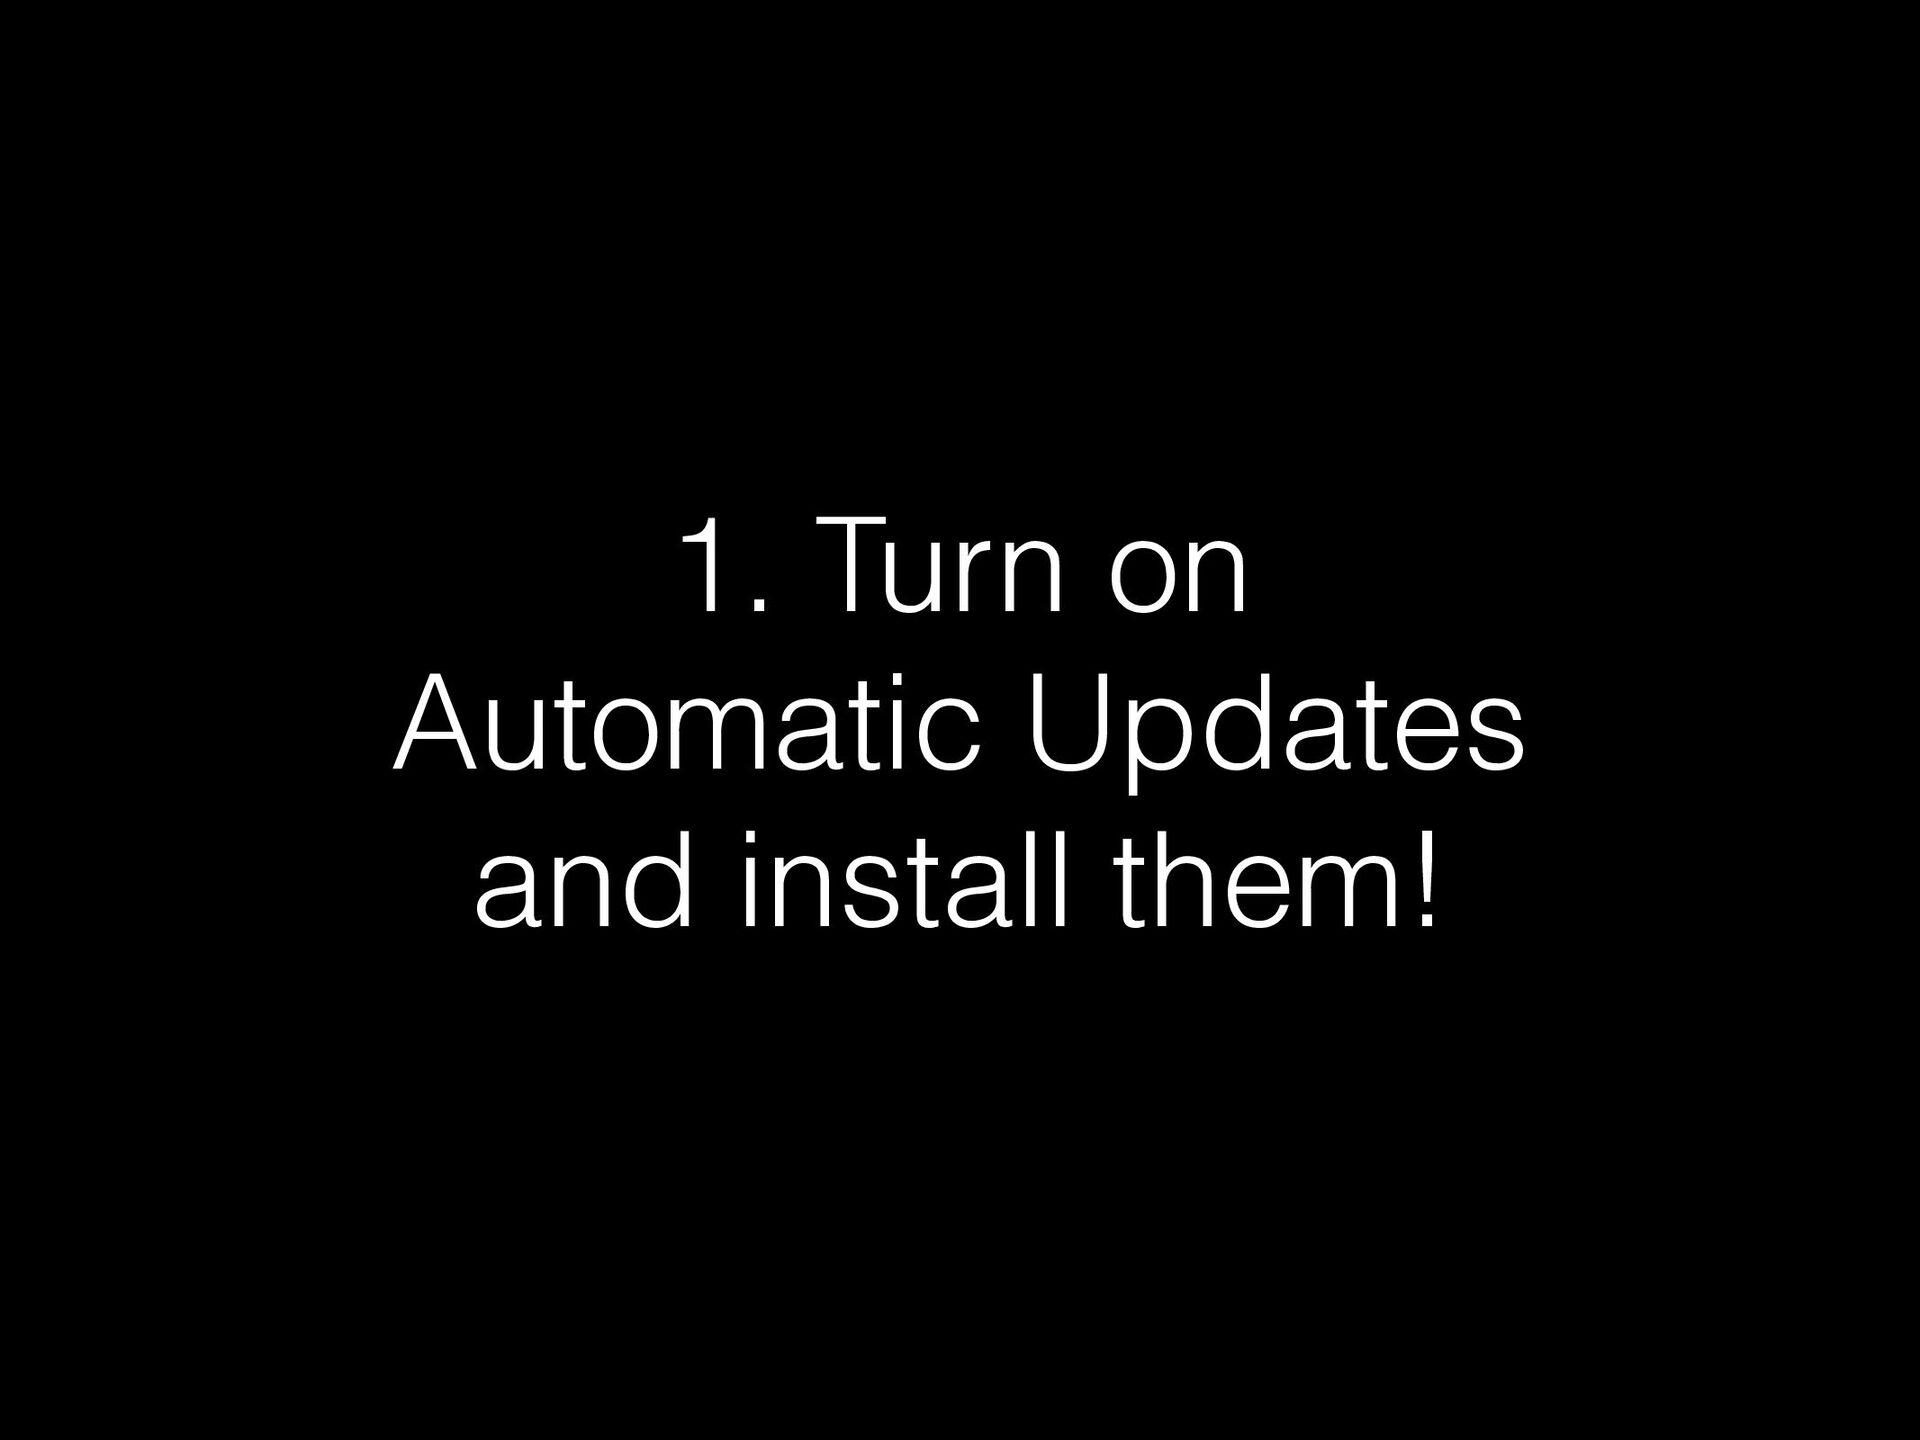 Bonus points: USB Data Blockers